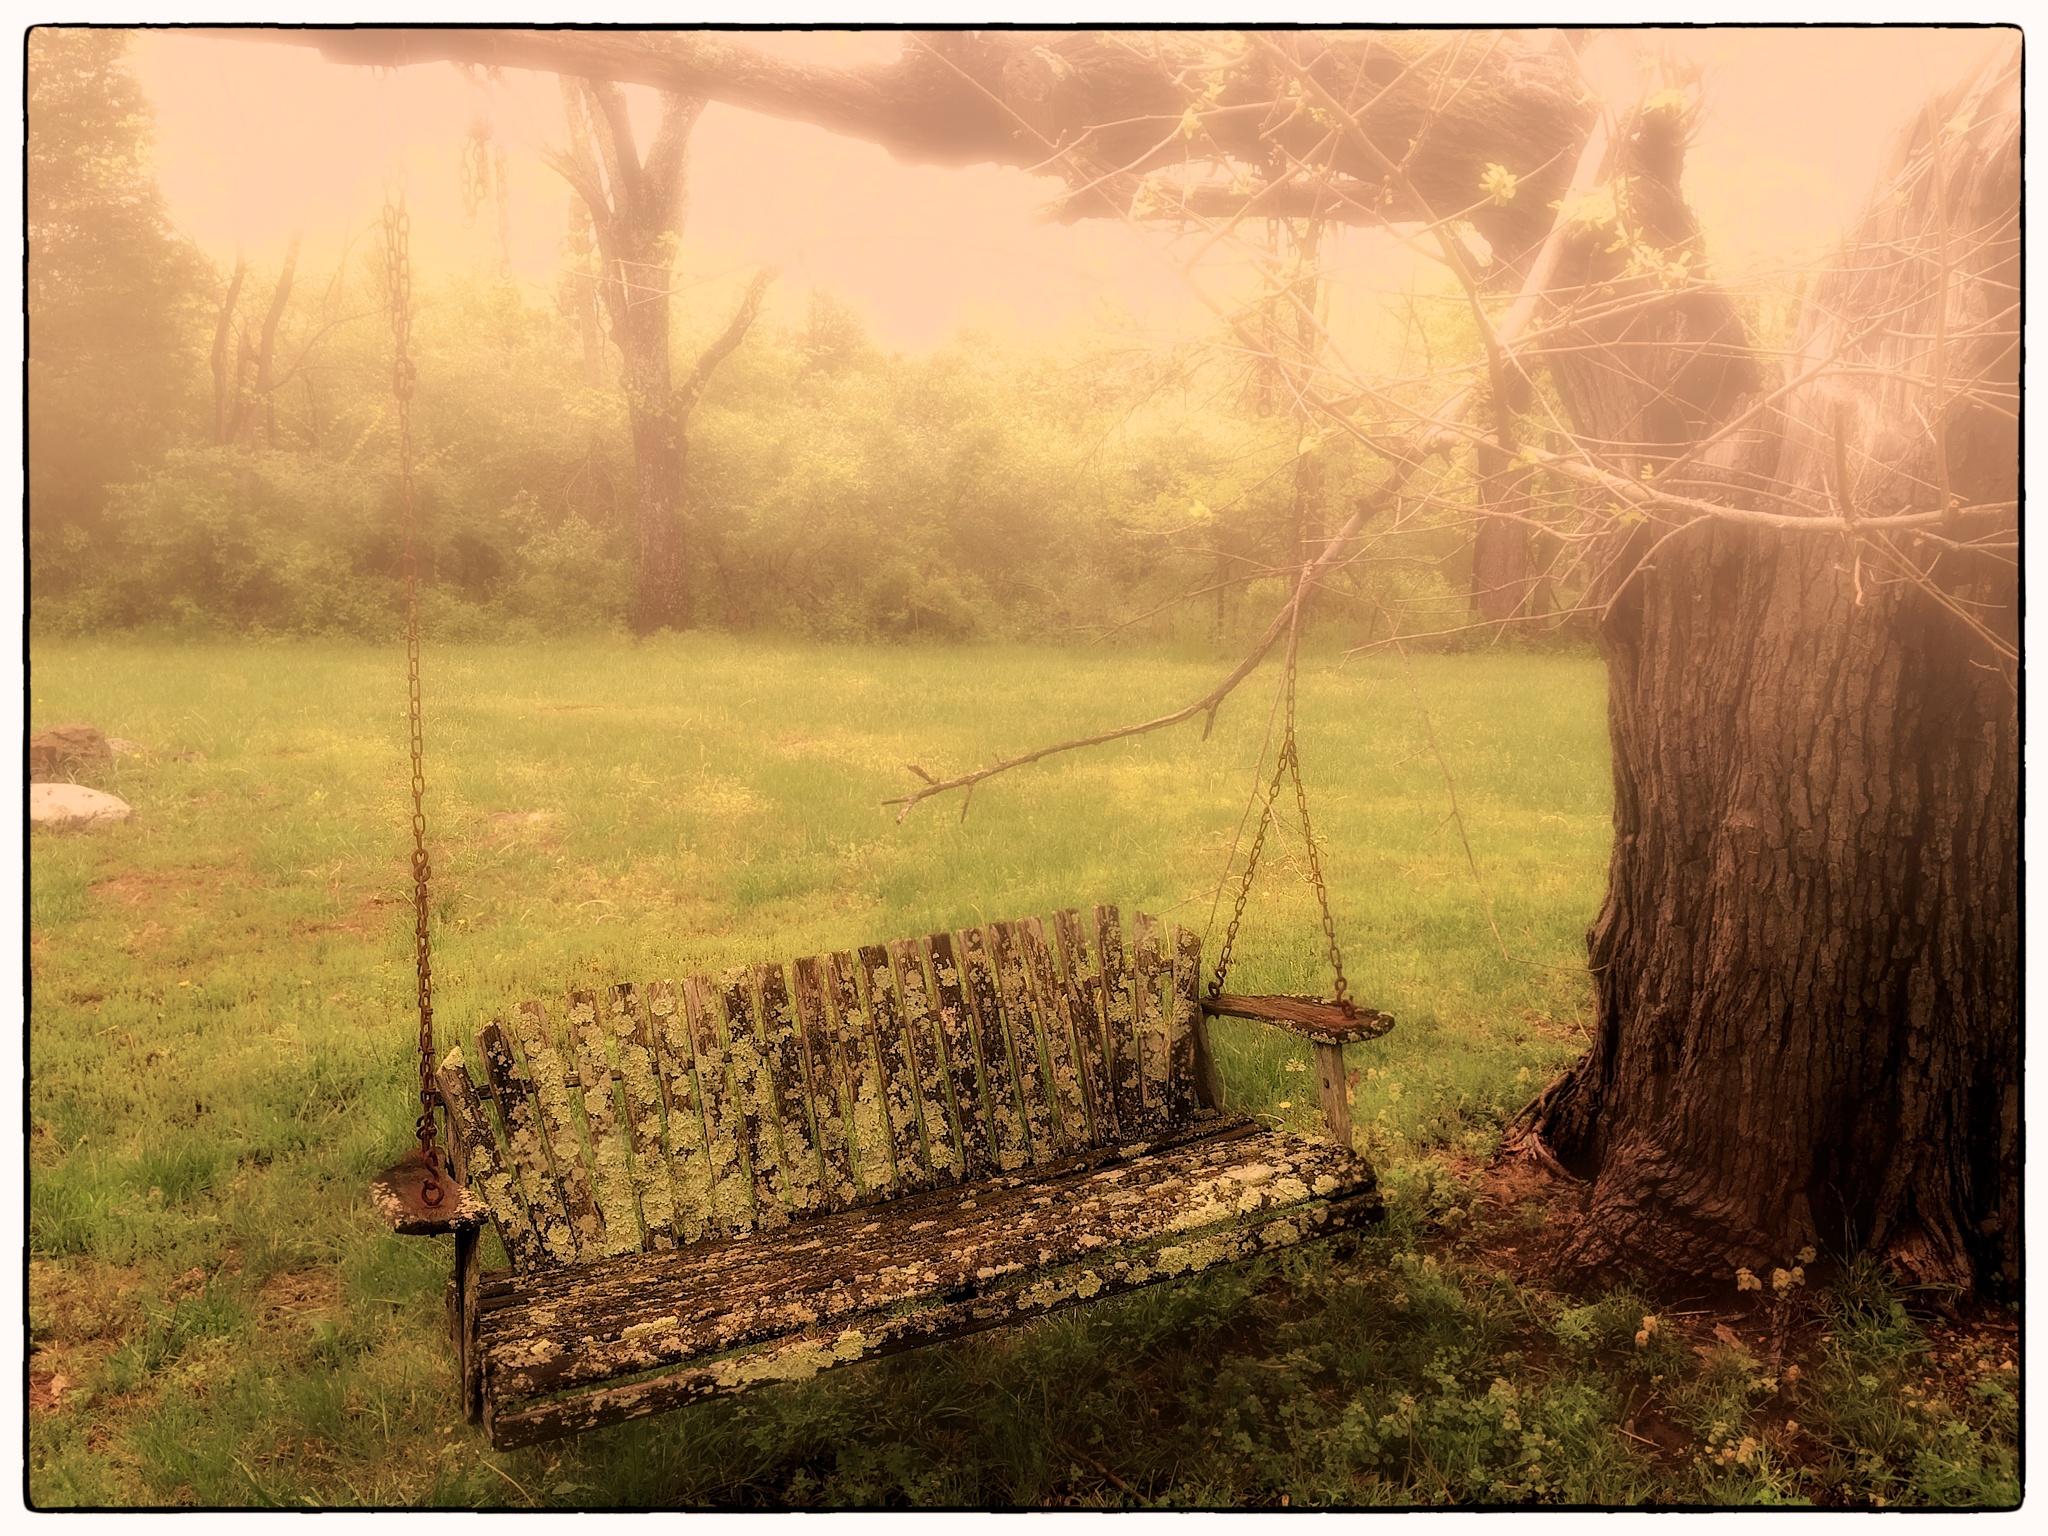 Recalling 1st love by imagemaker